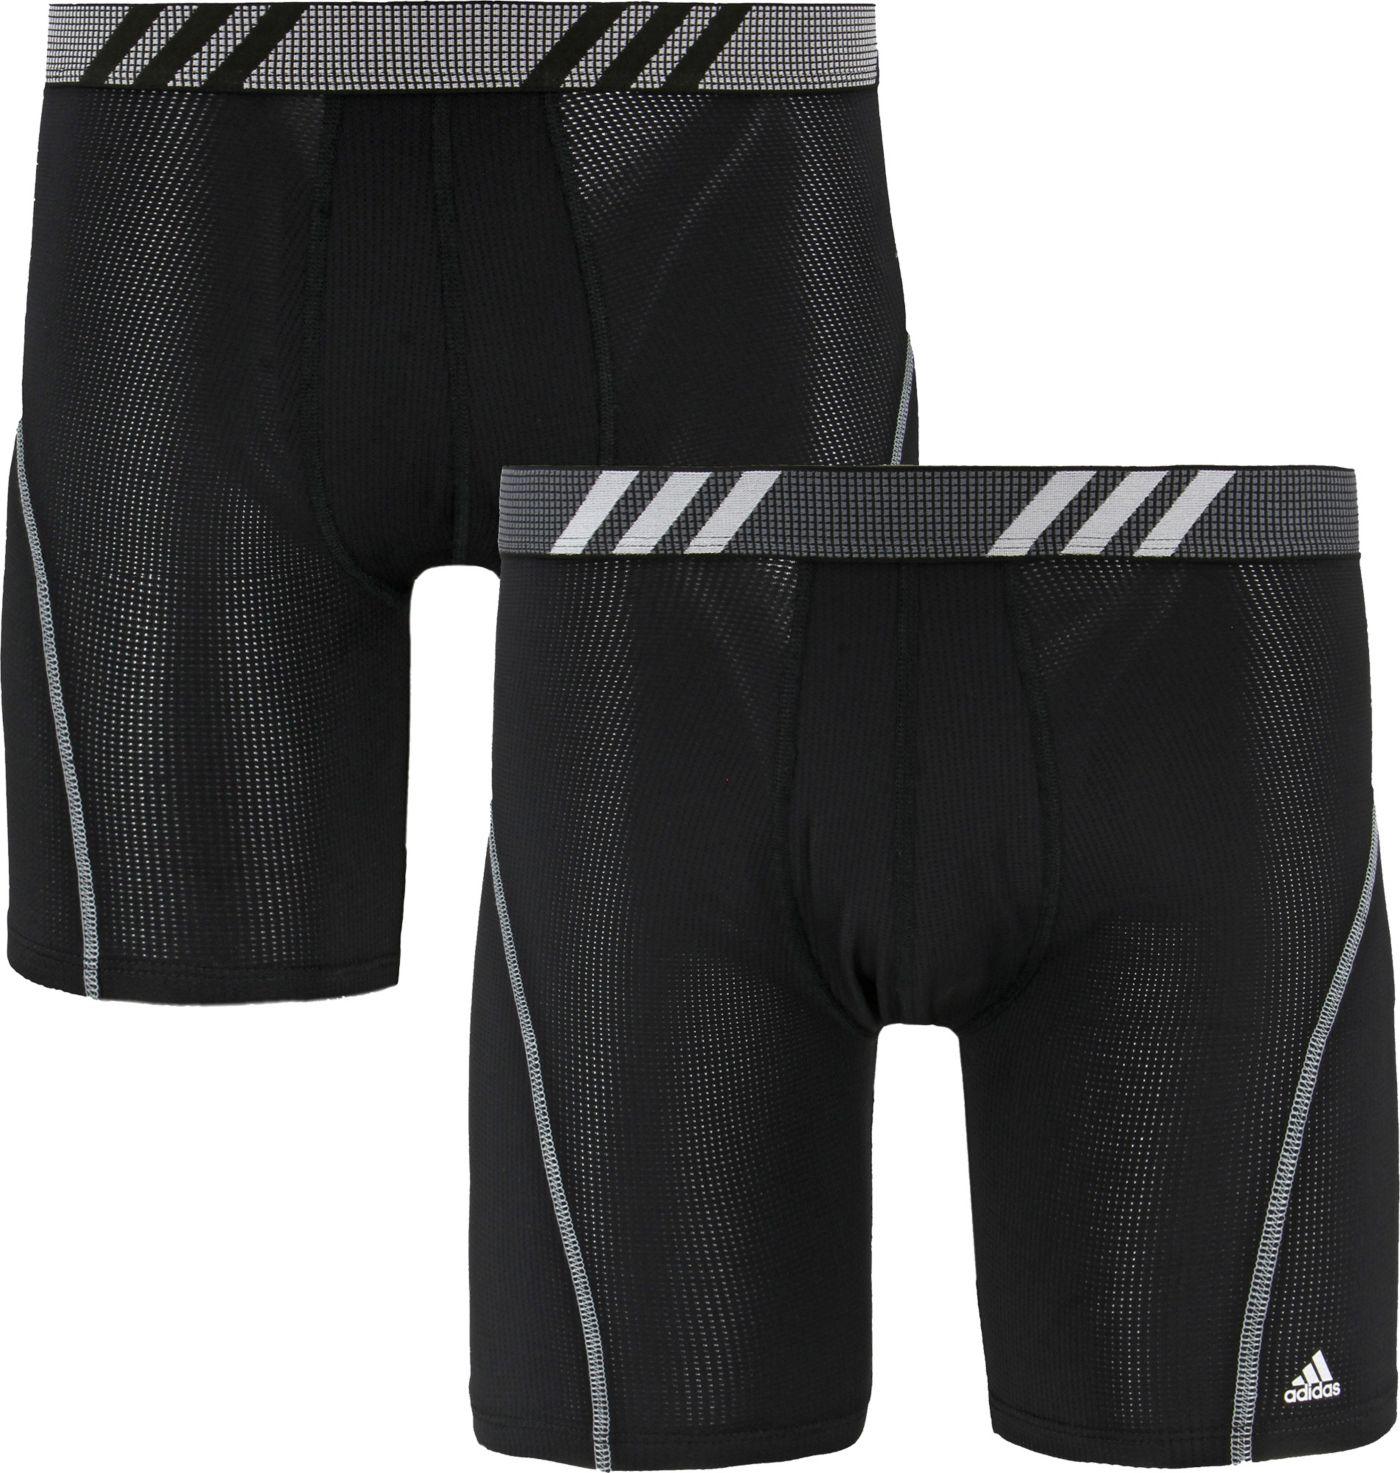 adidas Men's Sport Performance Mesh Midway Boxer Briefs – 2 Pack